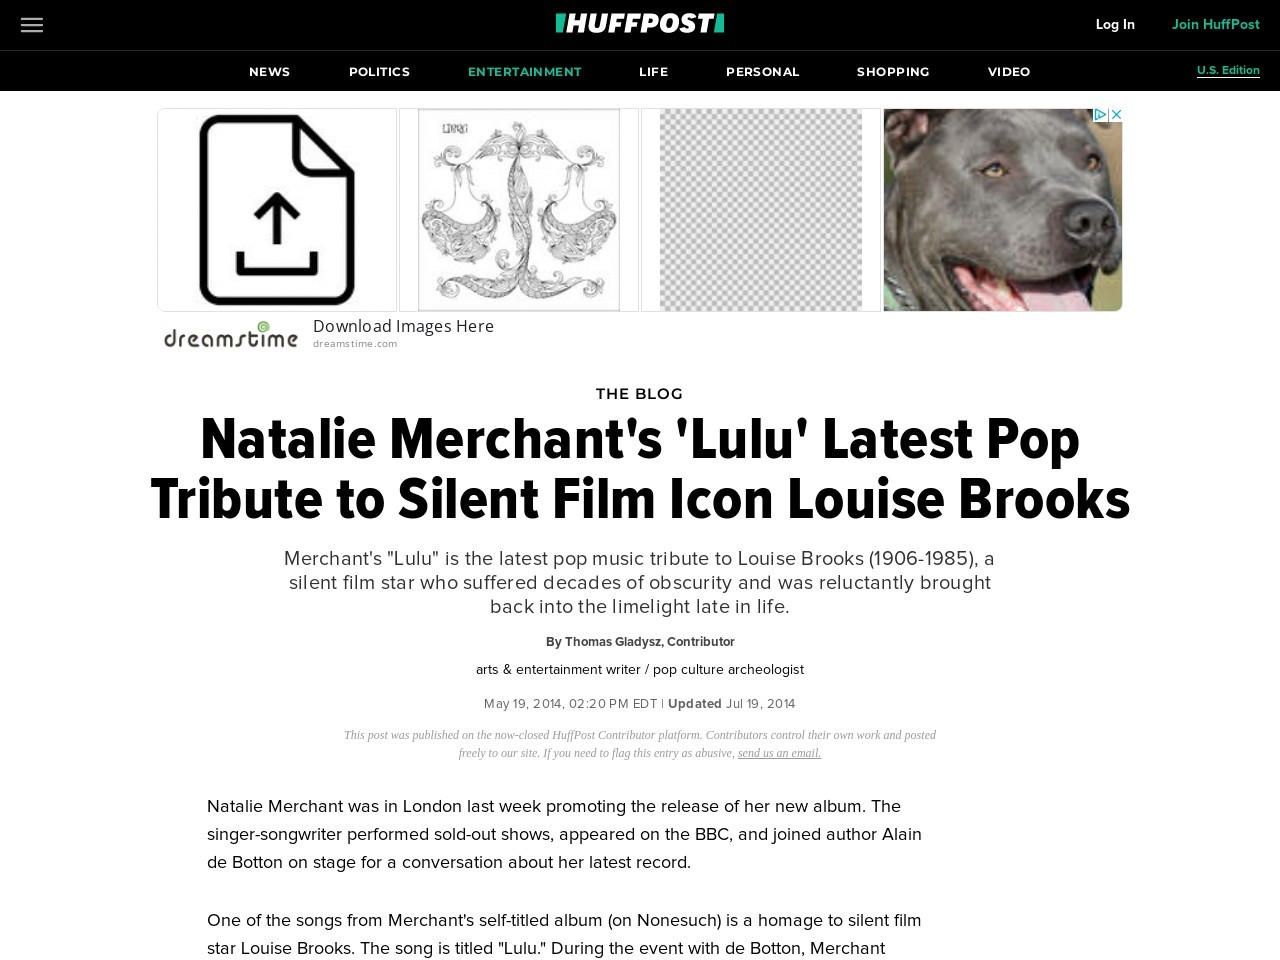 Natalie Merchant's 'Lulu' Latest Pop Tribute to Silent Film Icon Louise Brooks